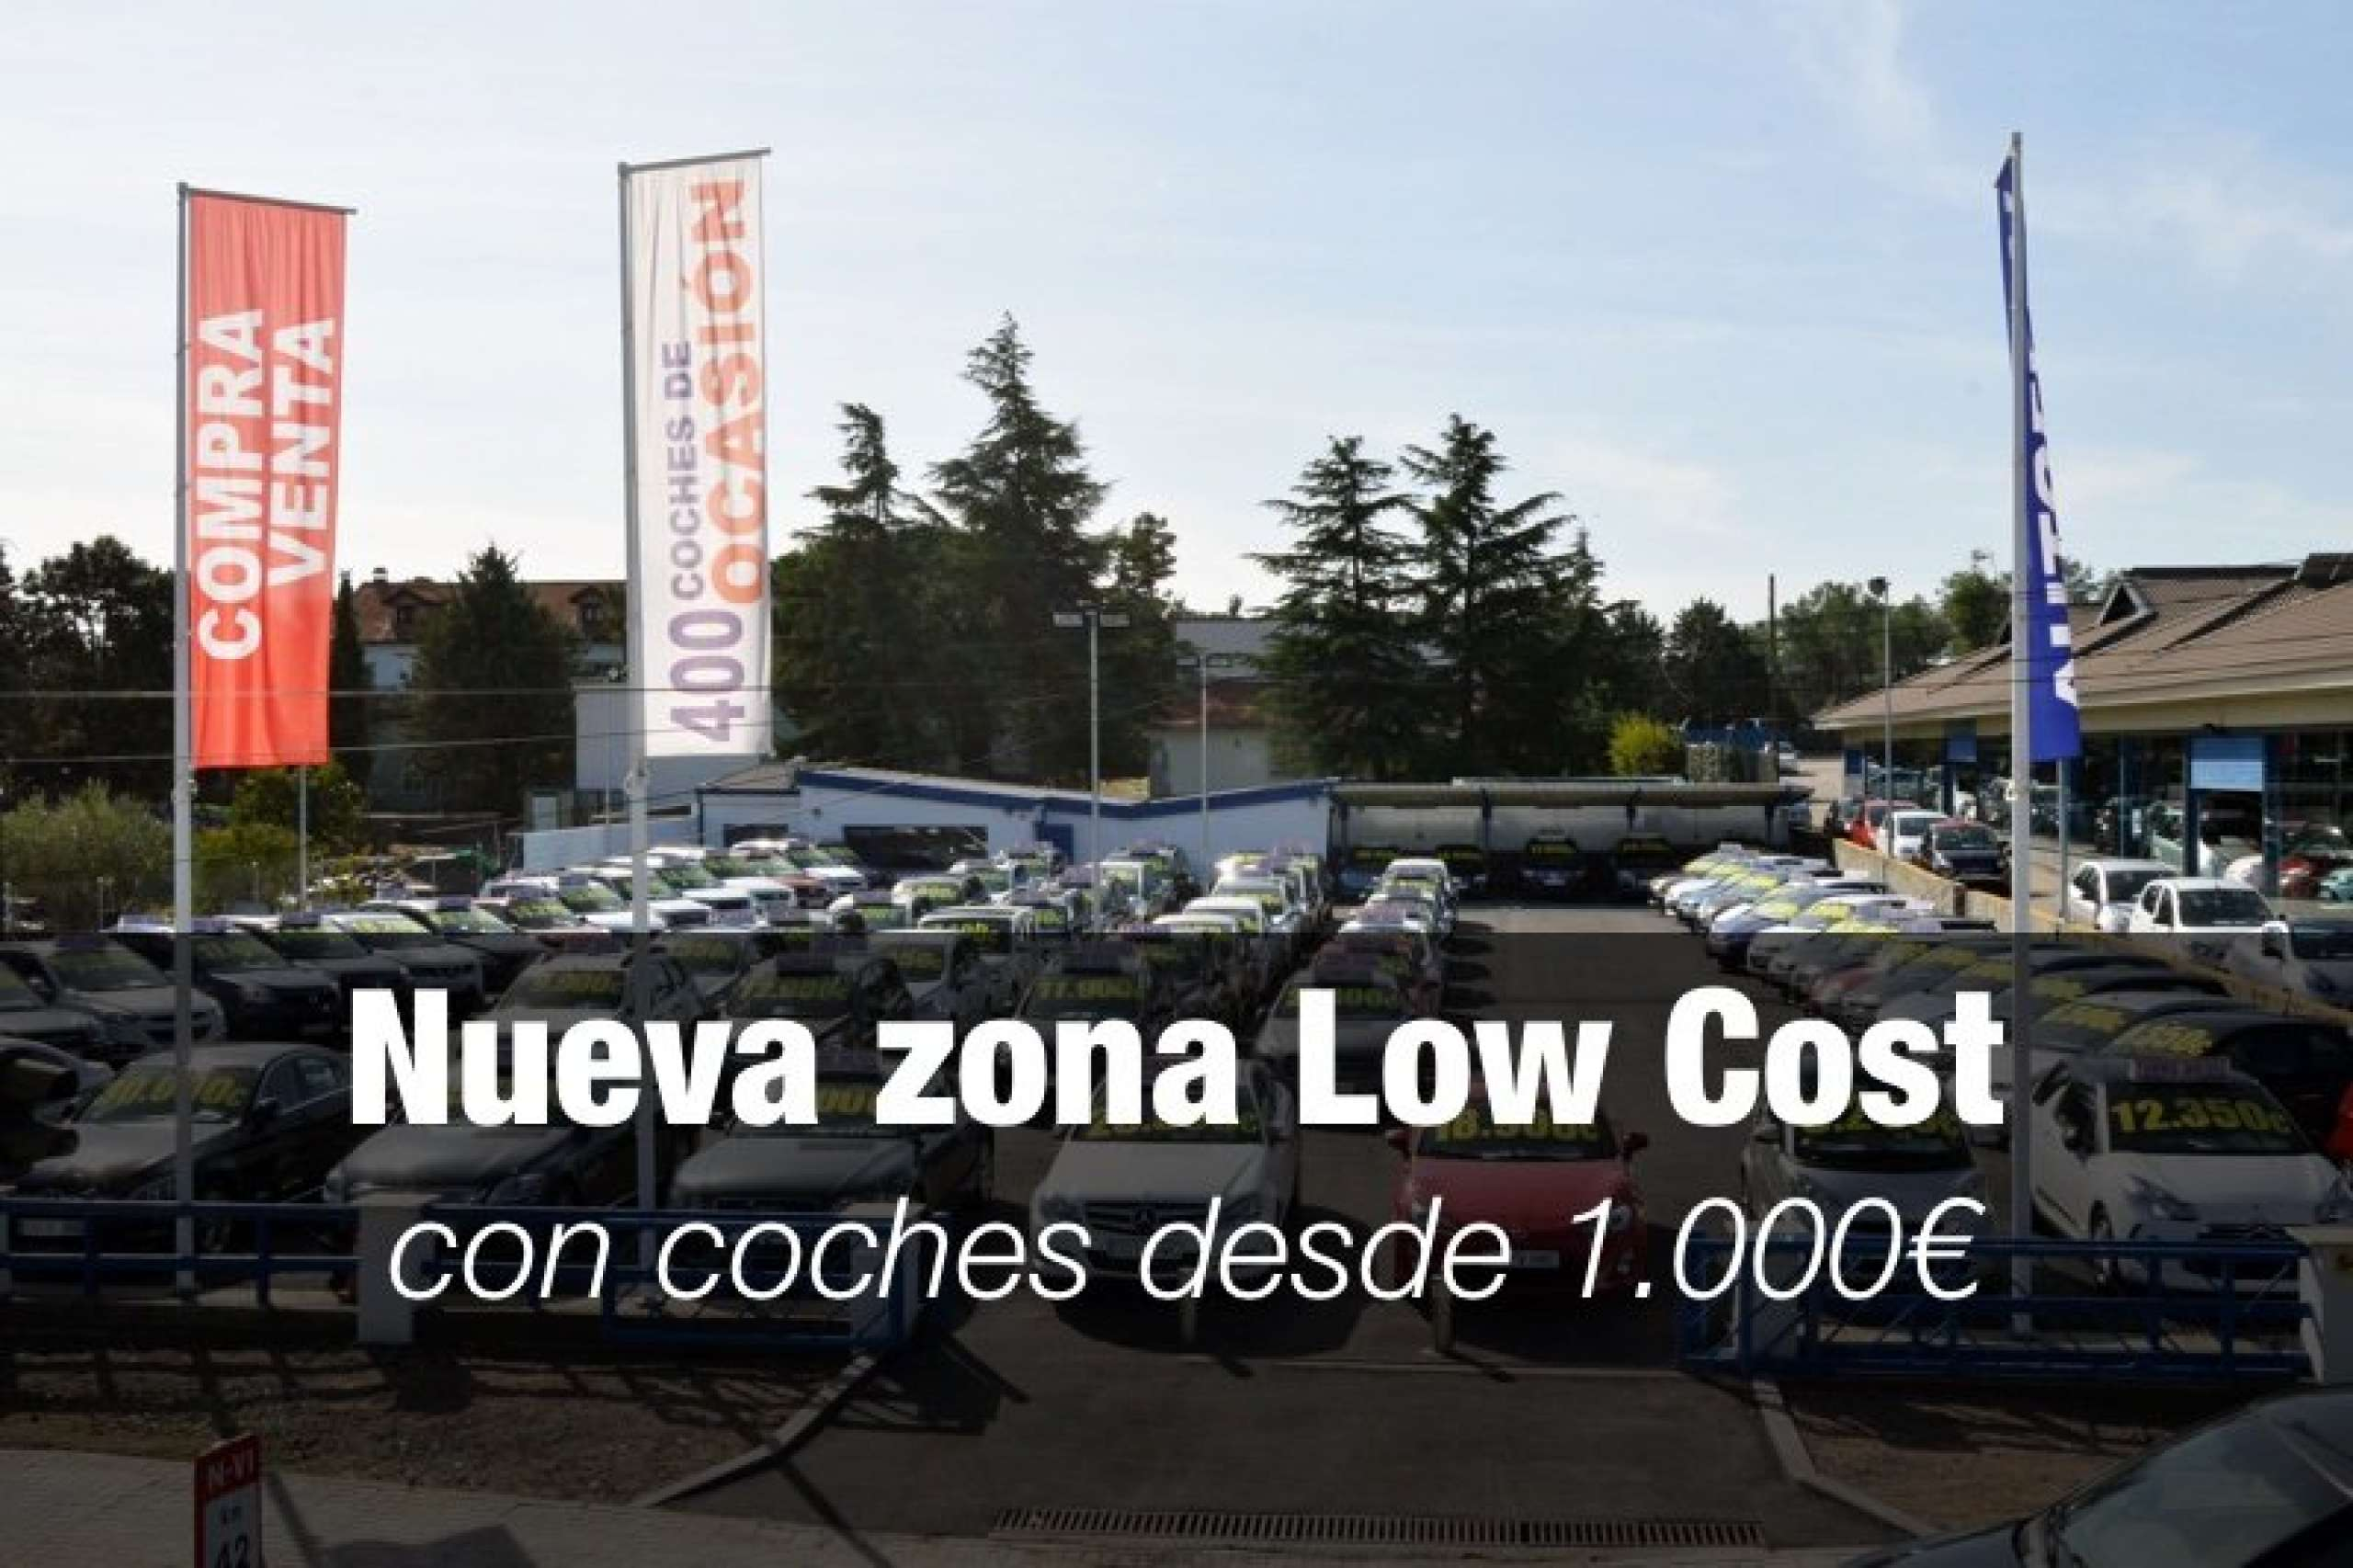 Lexus Ct 200h 1.8 136cv Eco Auto 5p - Foto 40